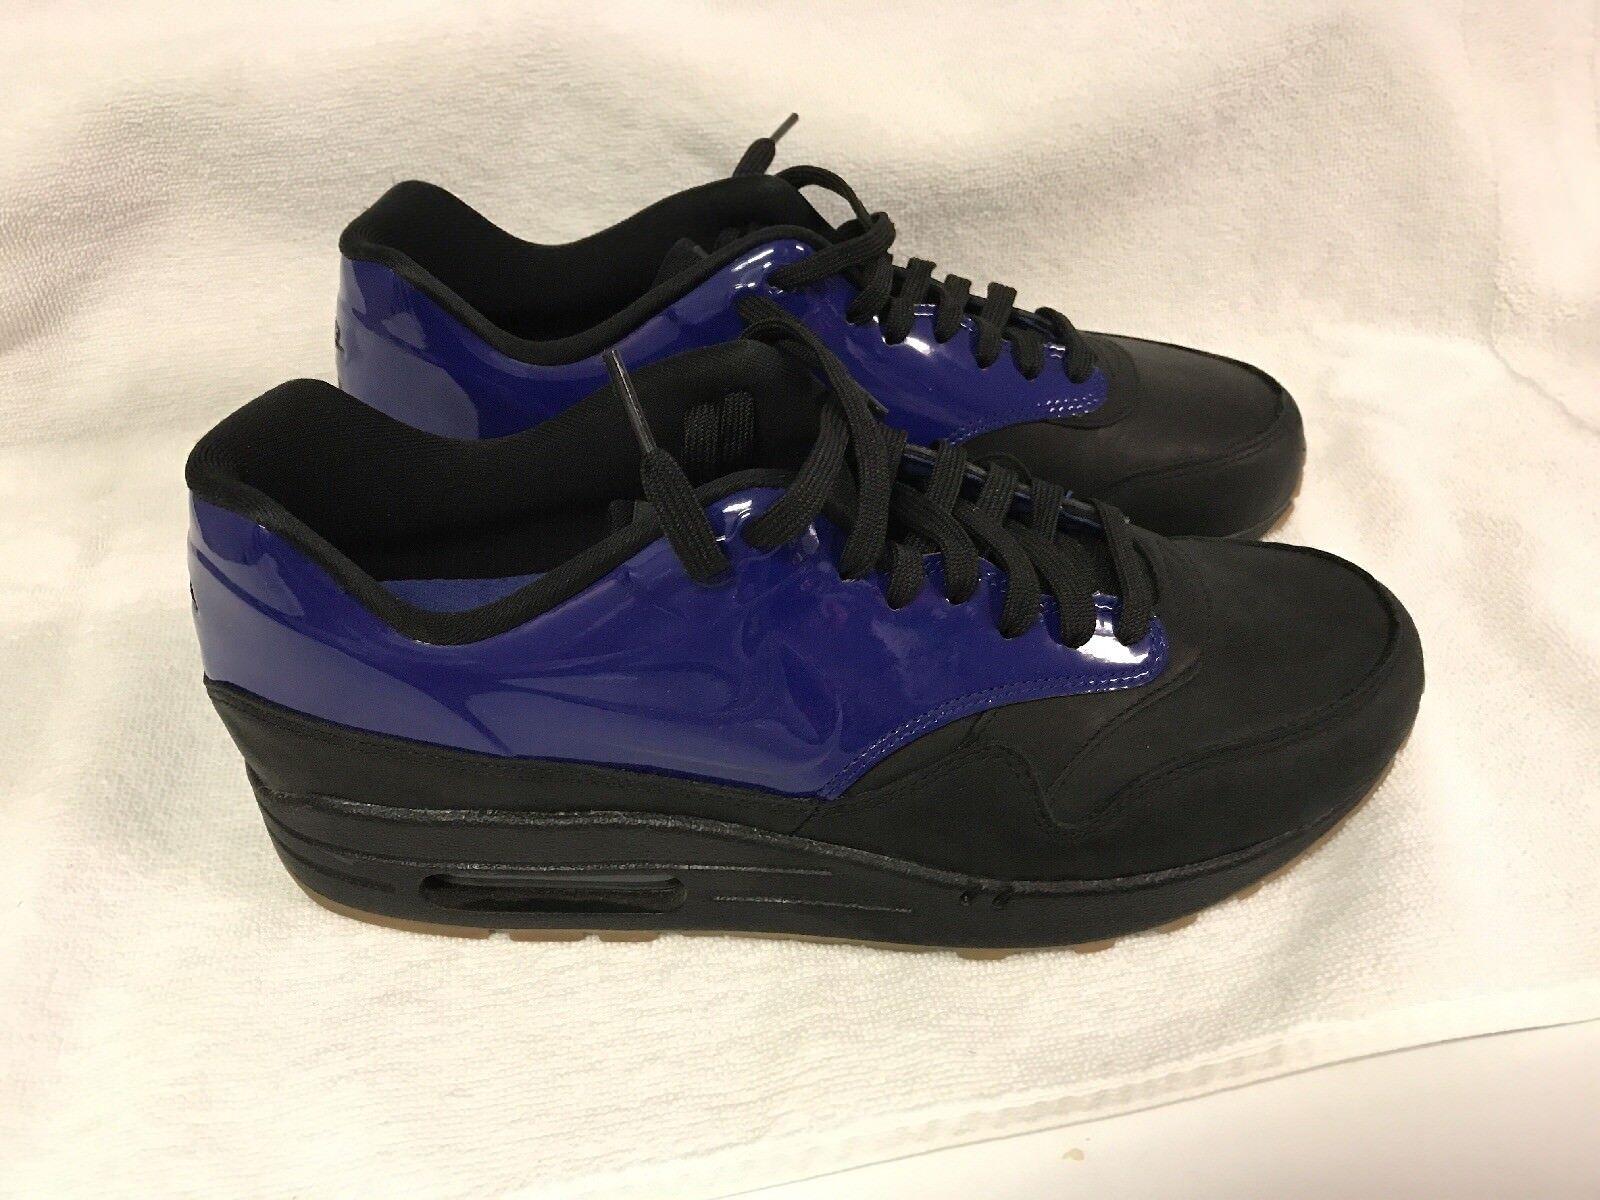 Nike Air Max 1 VT QS US Deep Royal Blue 831113-400 US QS Mens 9.5 6e6834